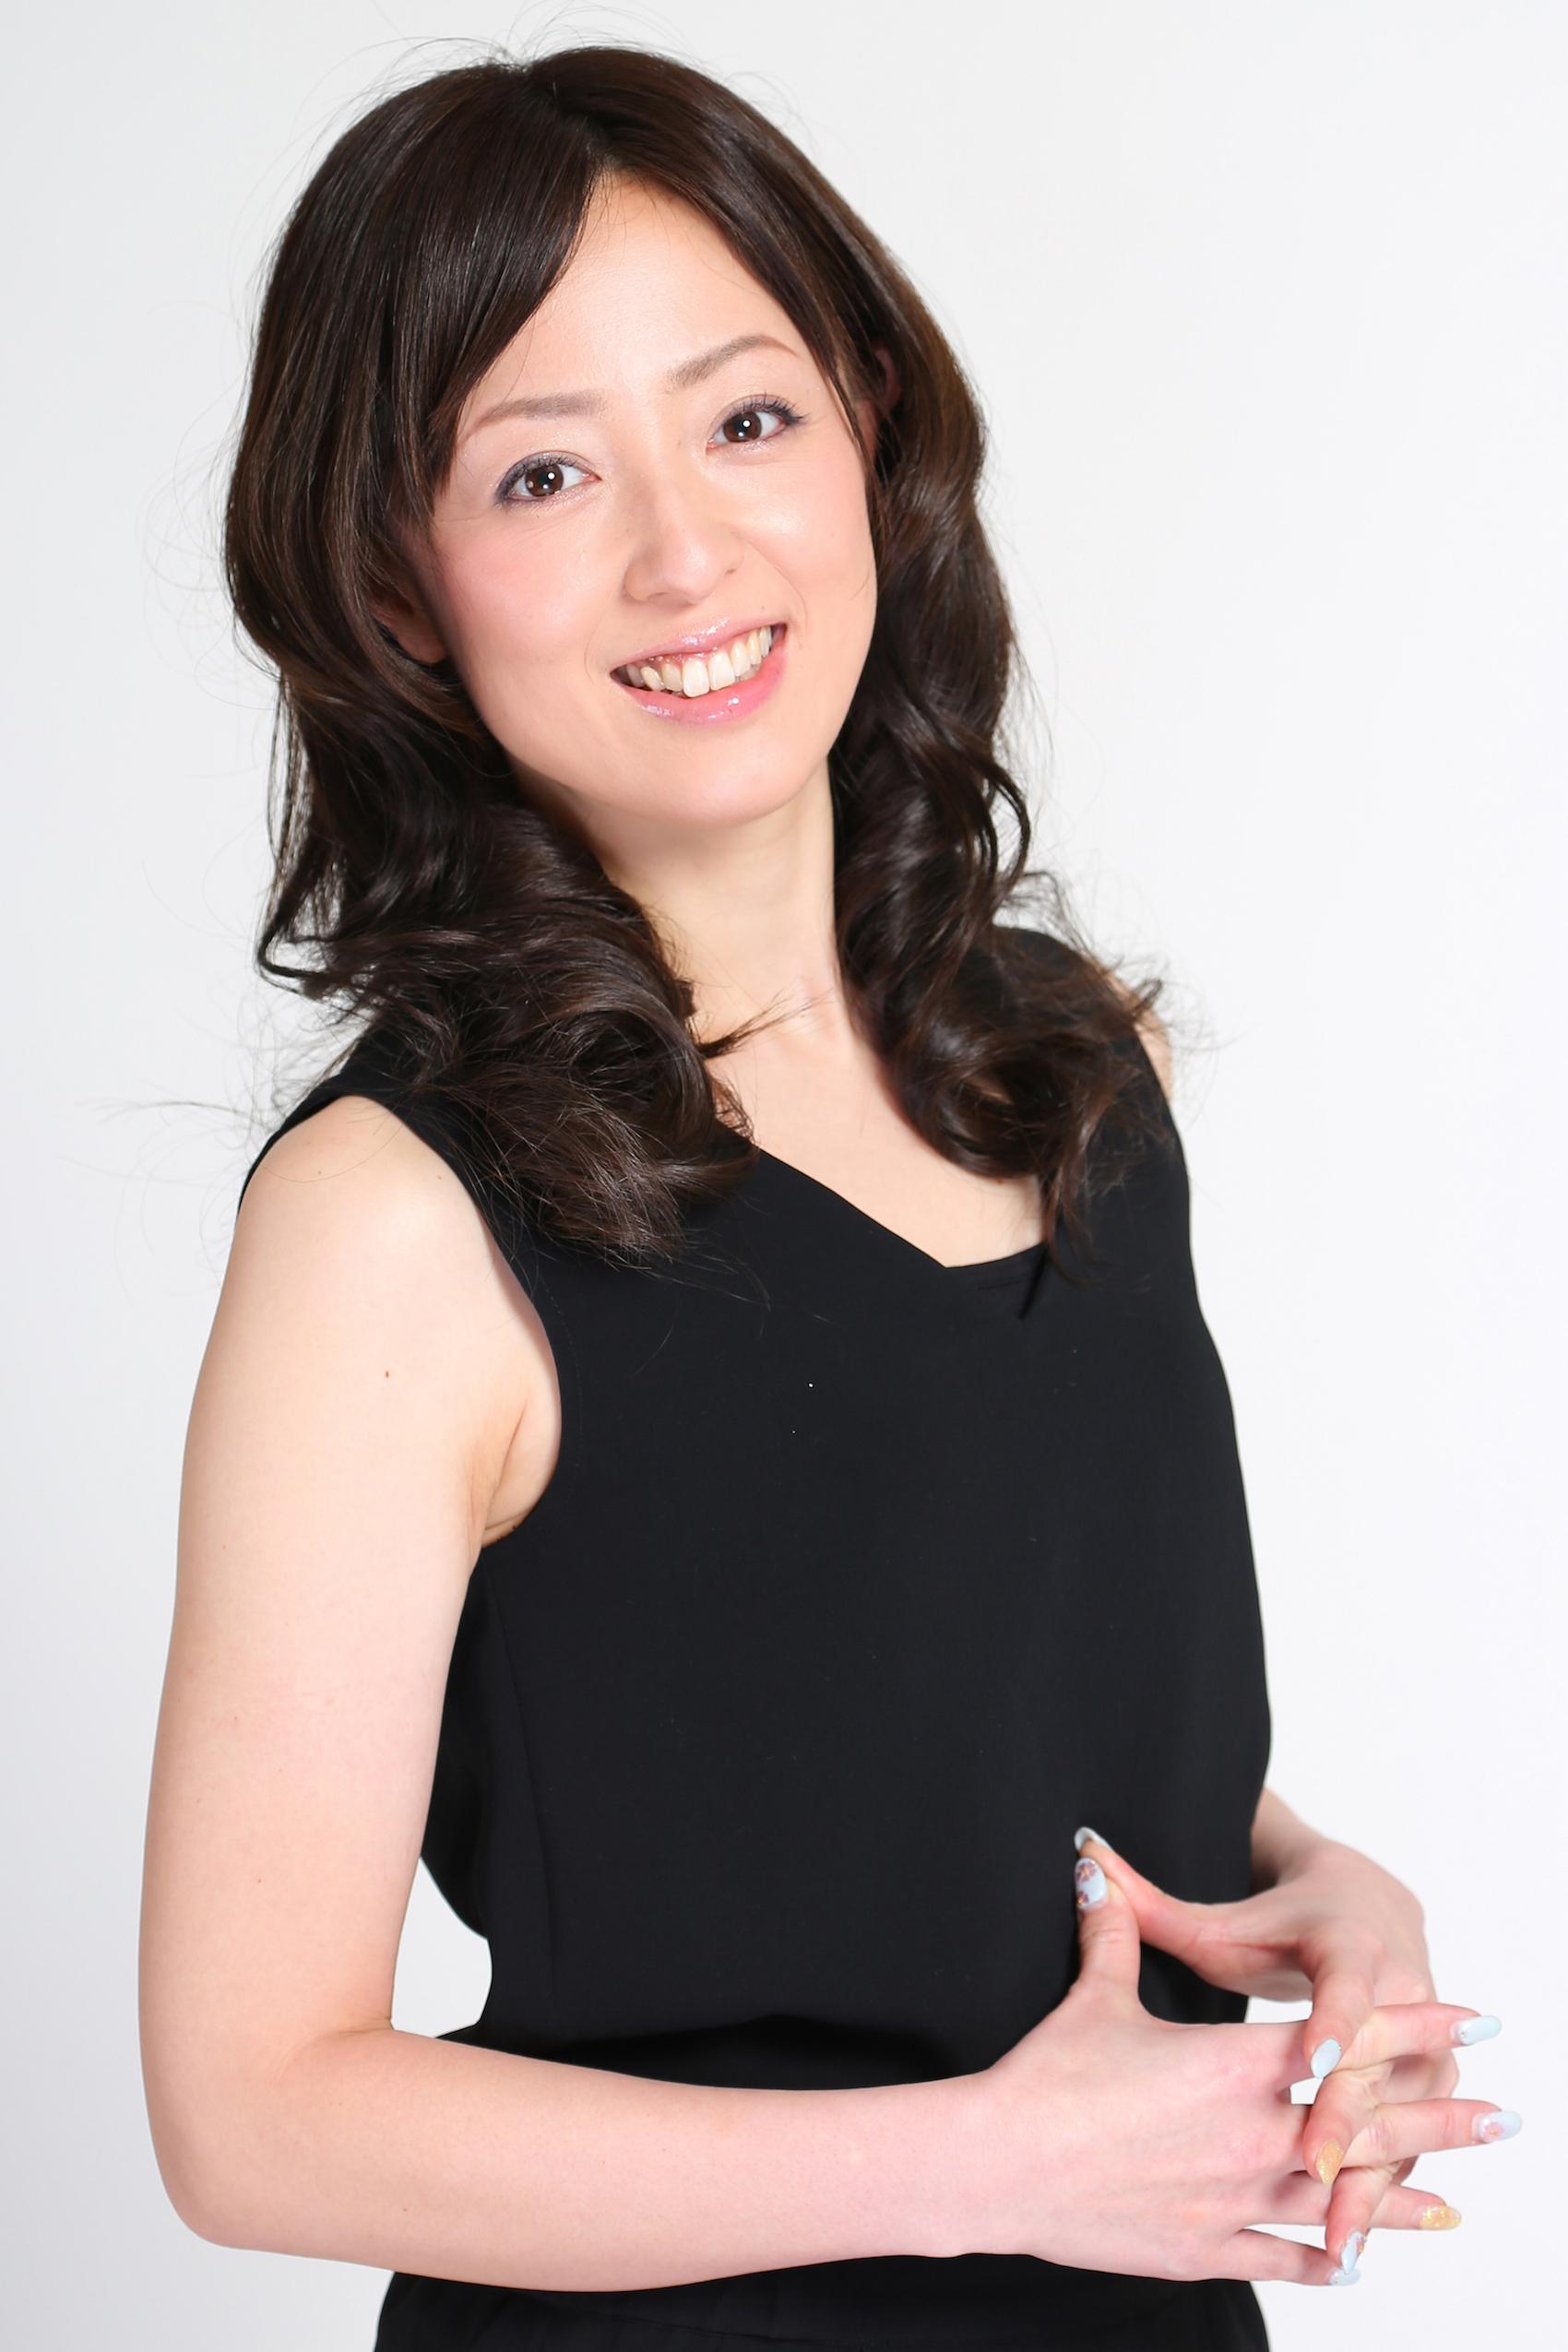 Yumiko Fujita Yumiko Fujita new pictures